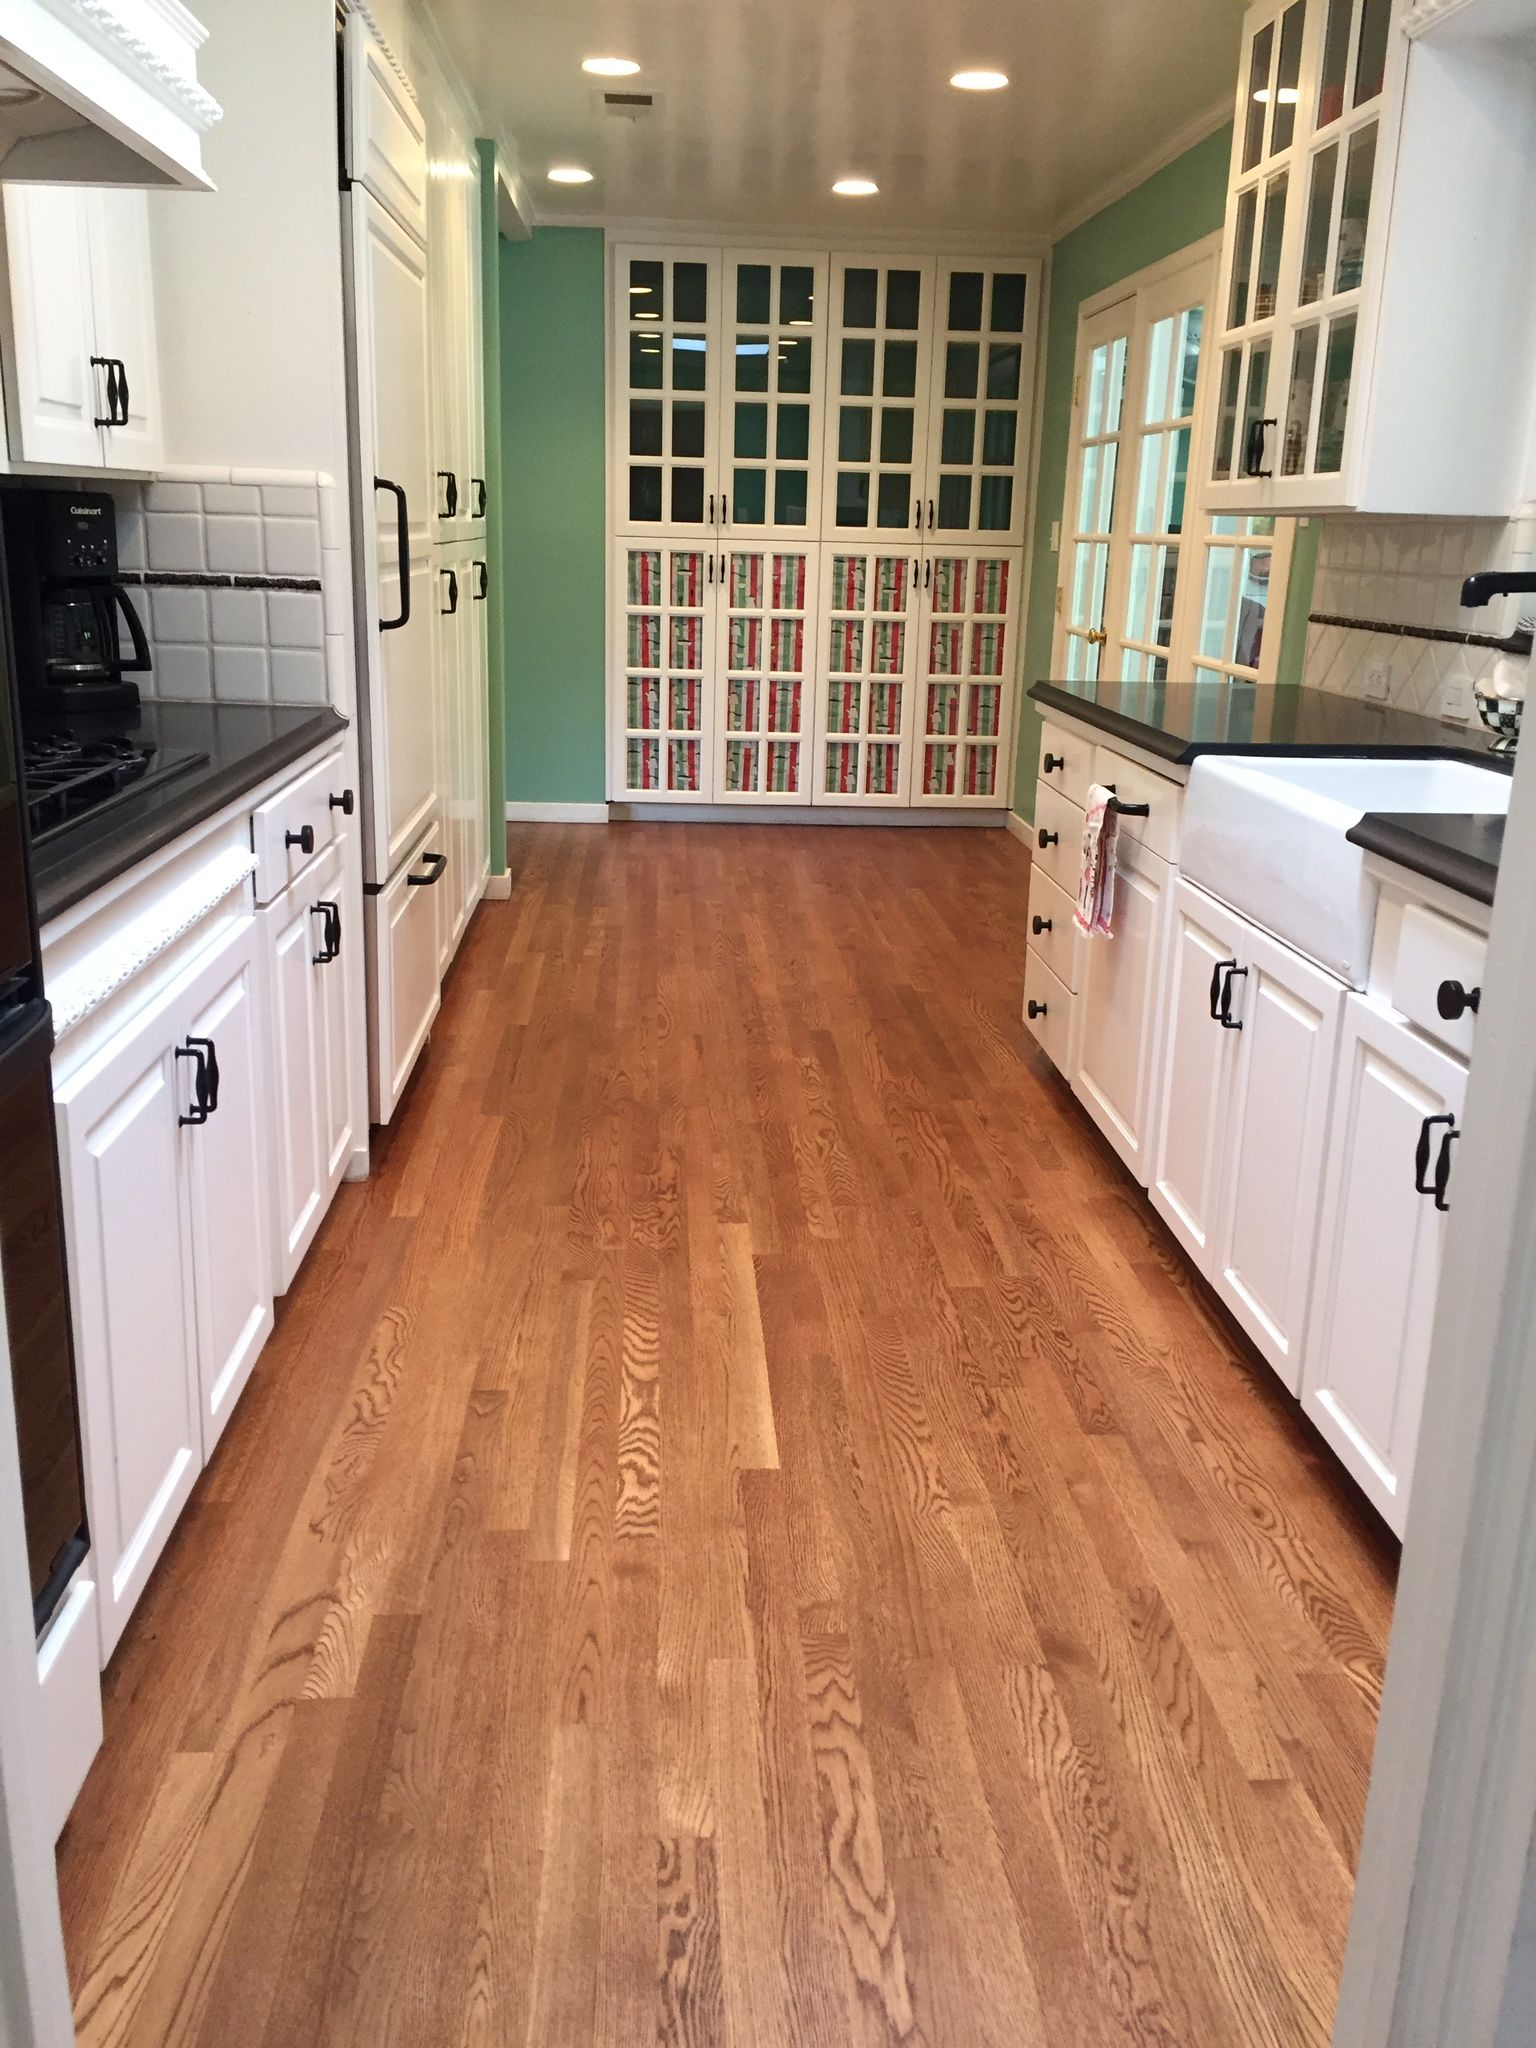 Kitchen floor white oak stained in English Chestnut